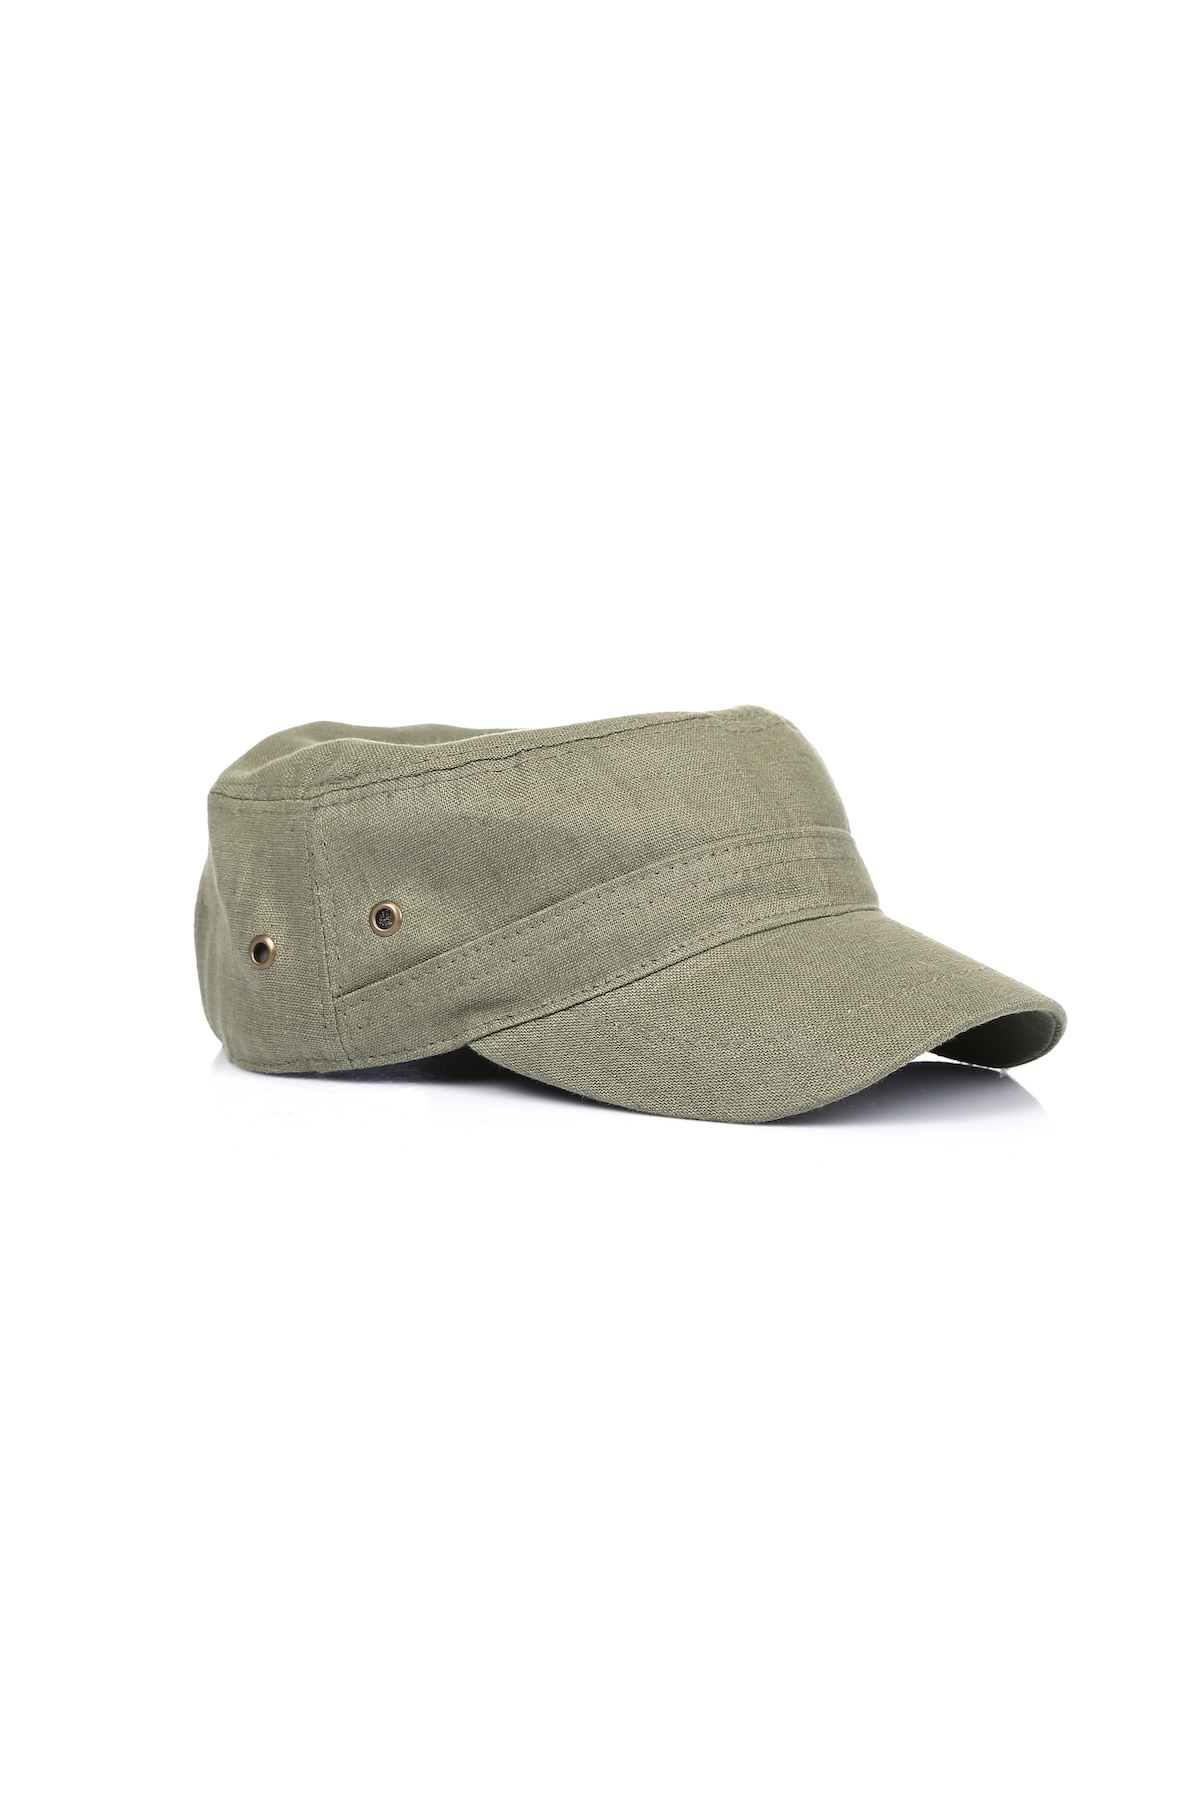 Spor Şapka Bere ve Atkı Modelleri